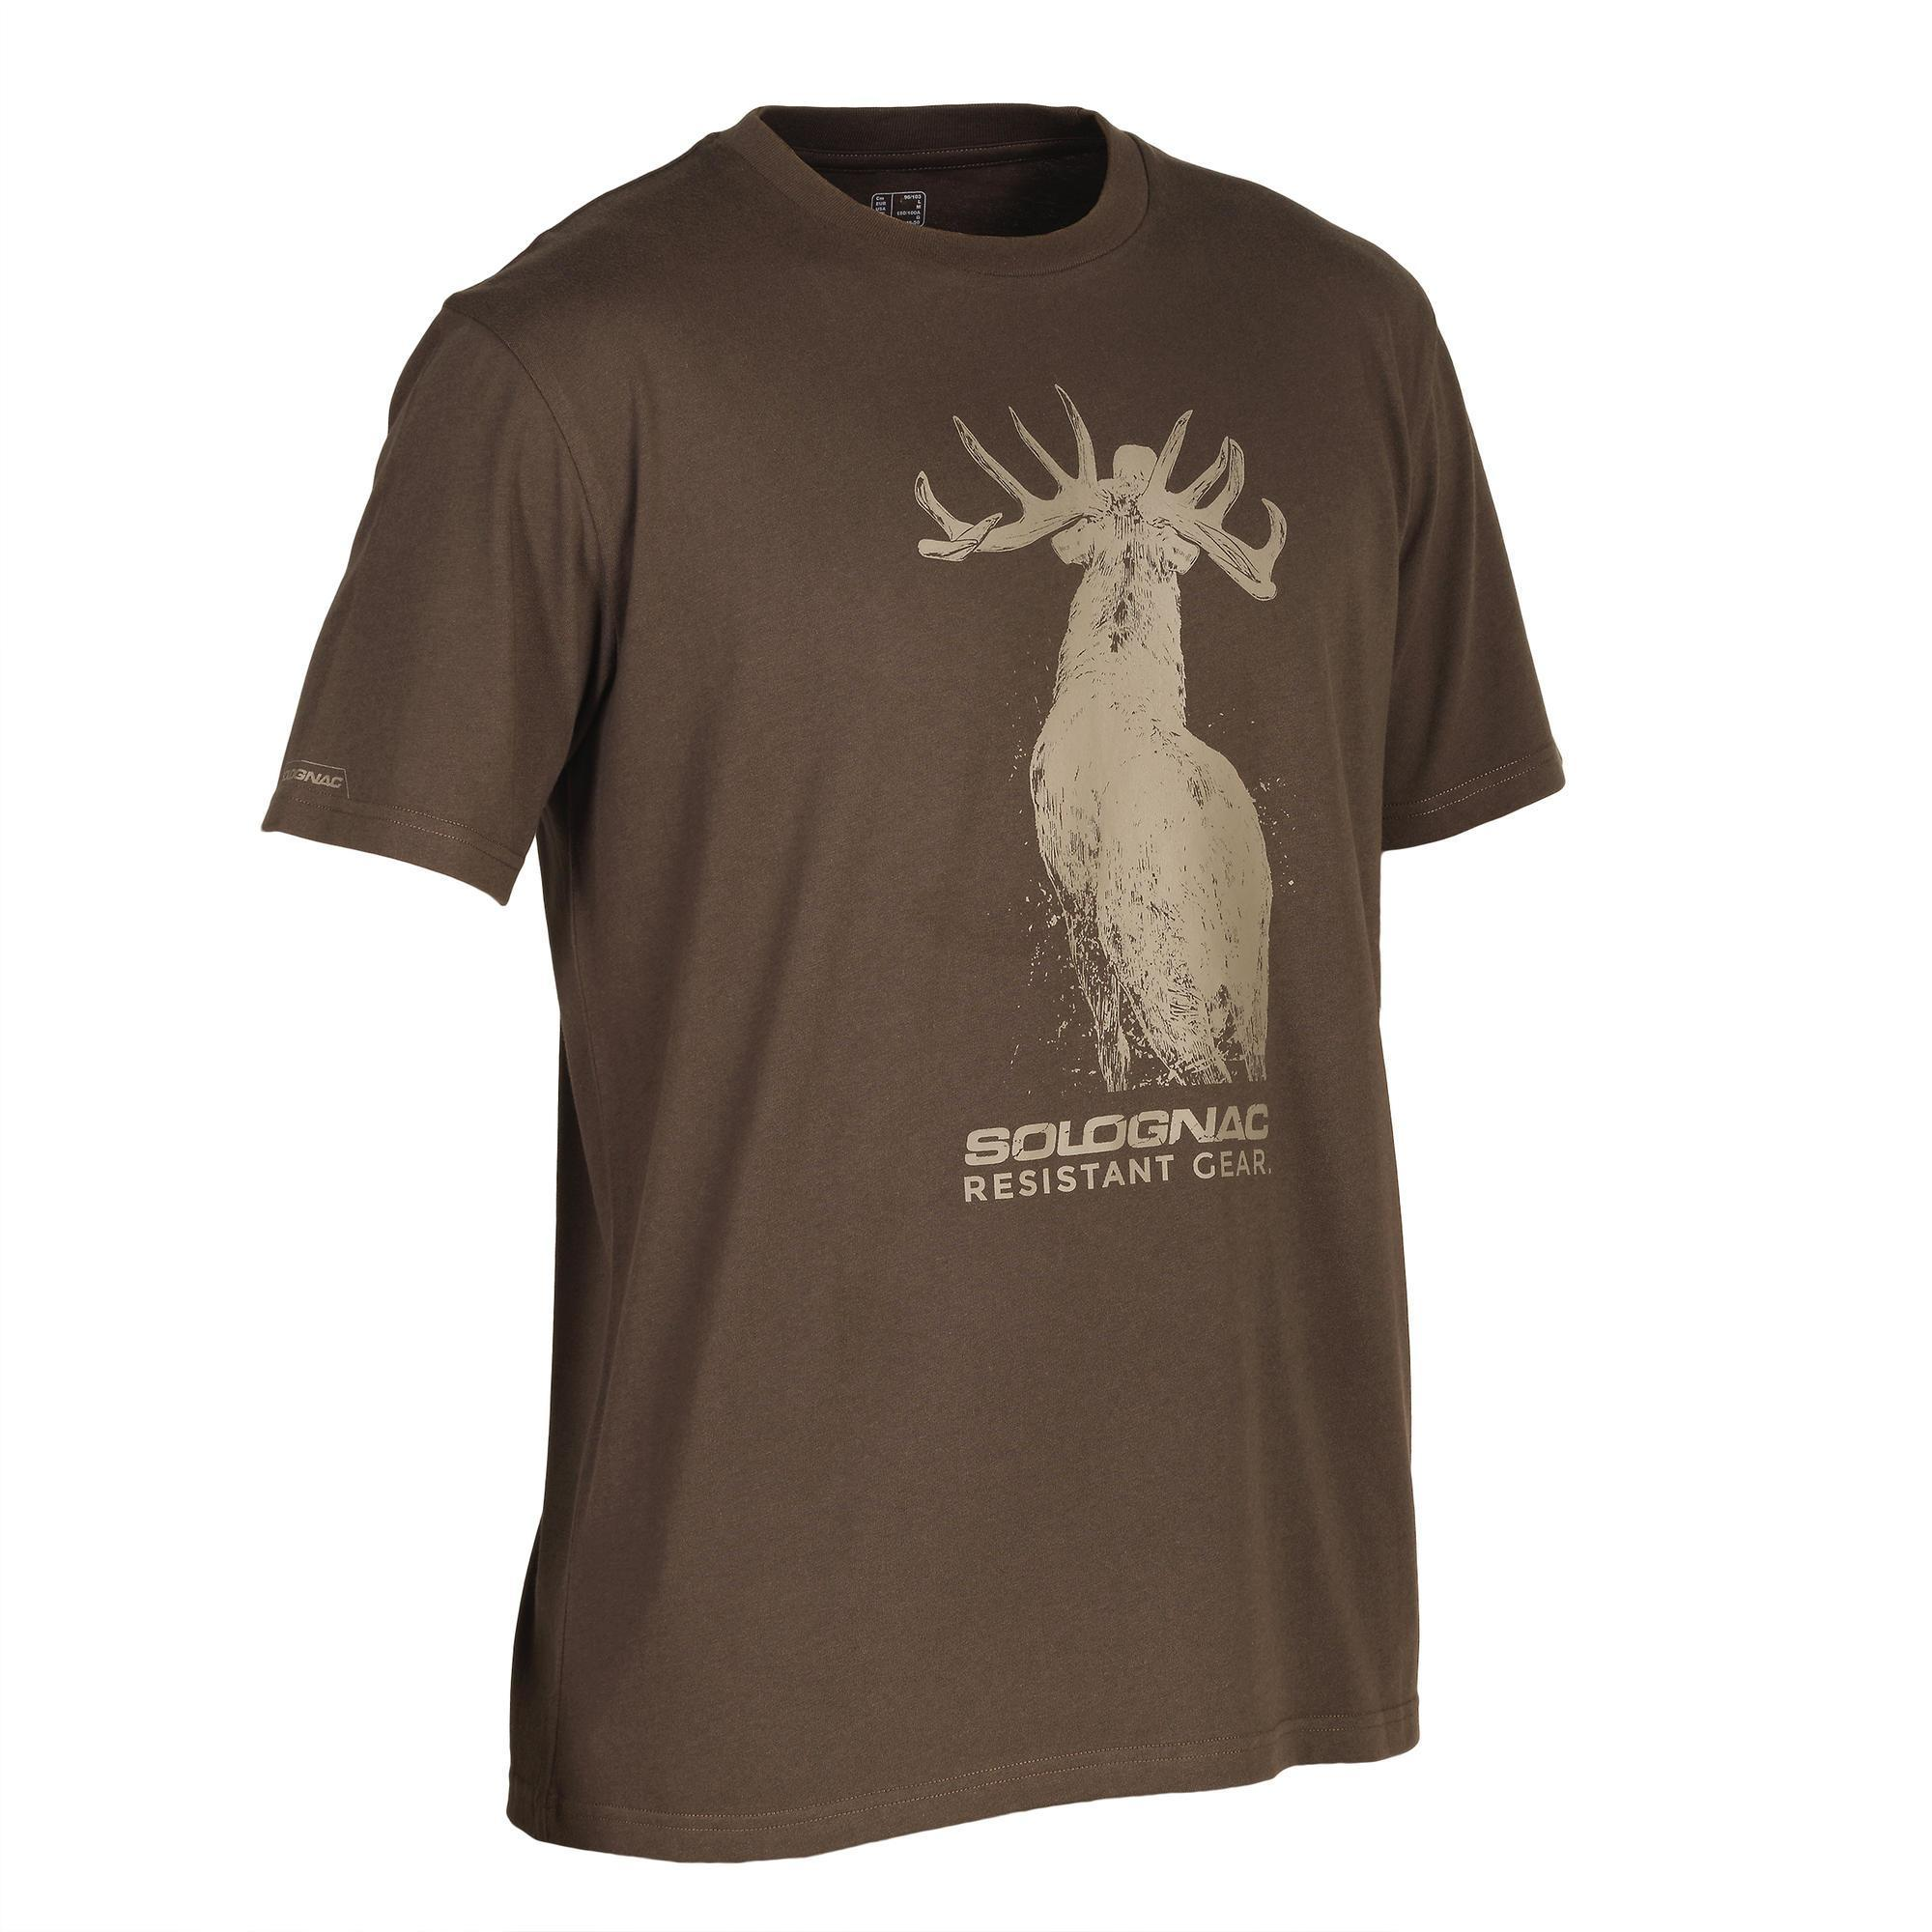 f6921c3292edcf Jagdshirts und T-Shirts